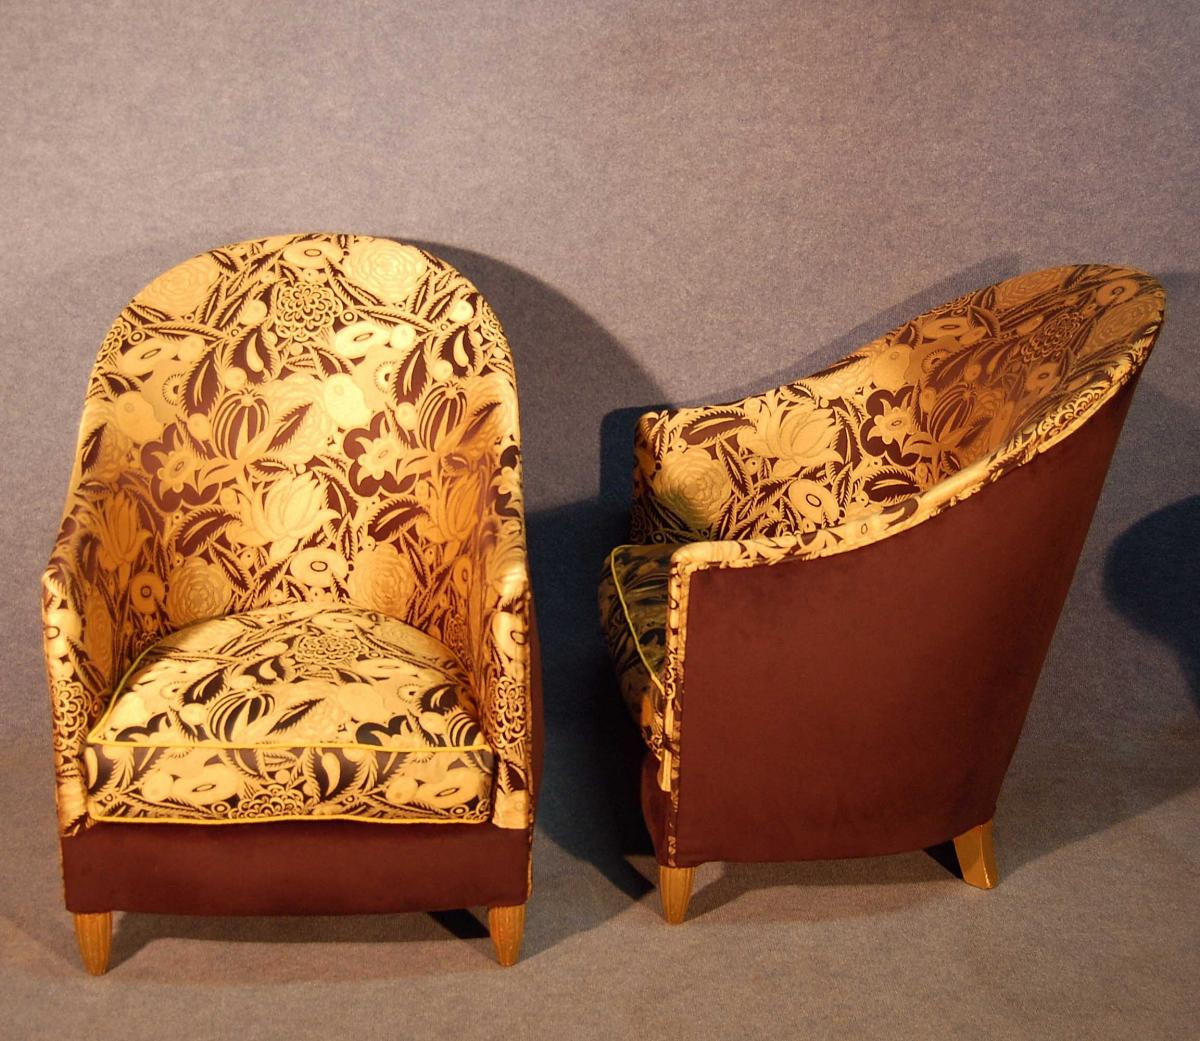 Art Deco armchairs by Maurice Dufrêne   Image source: twistmodern.com